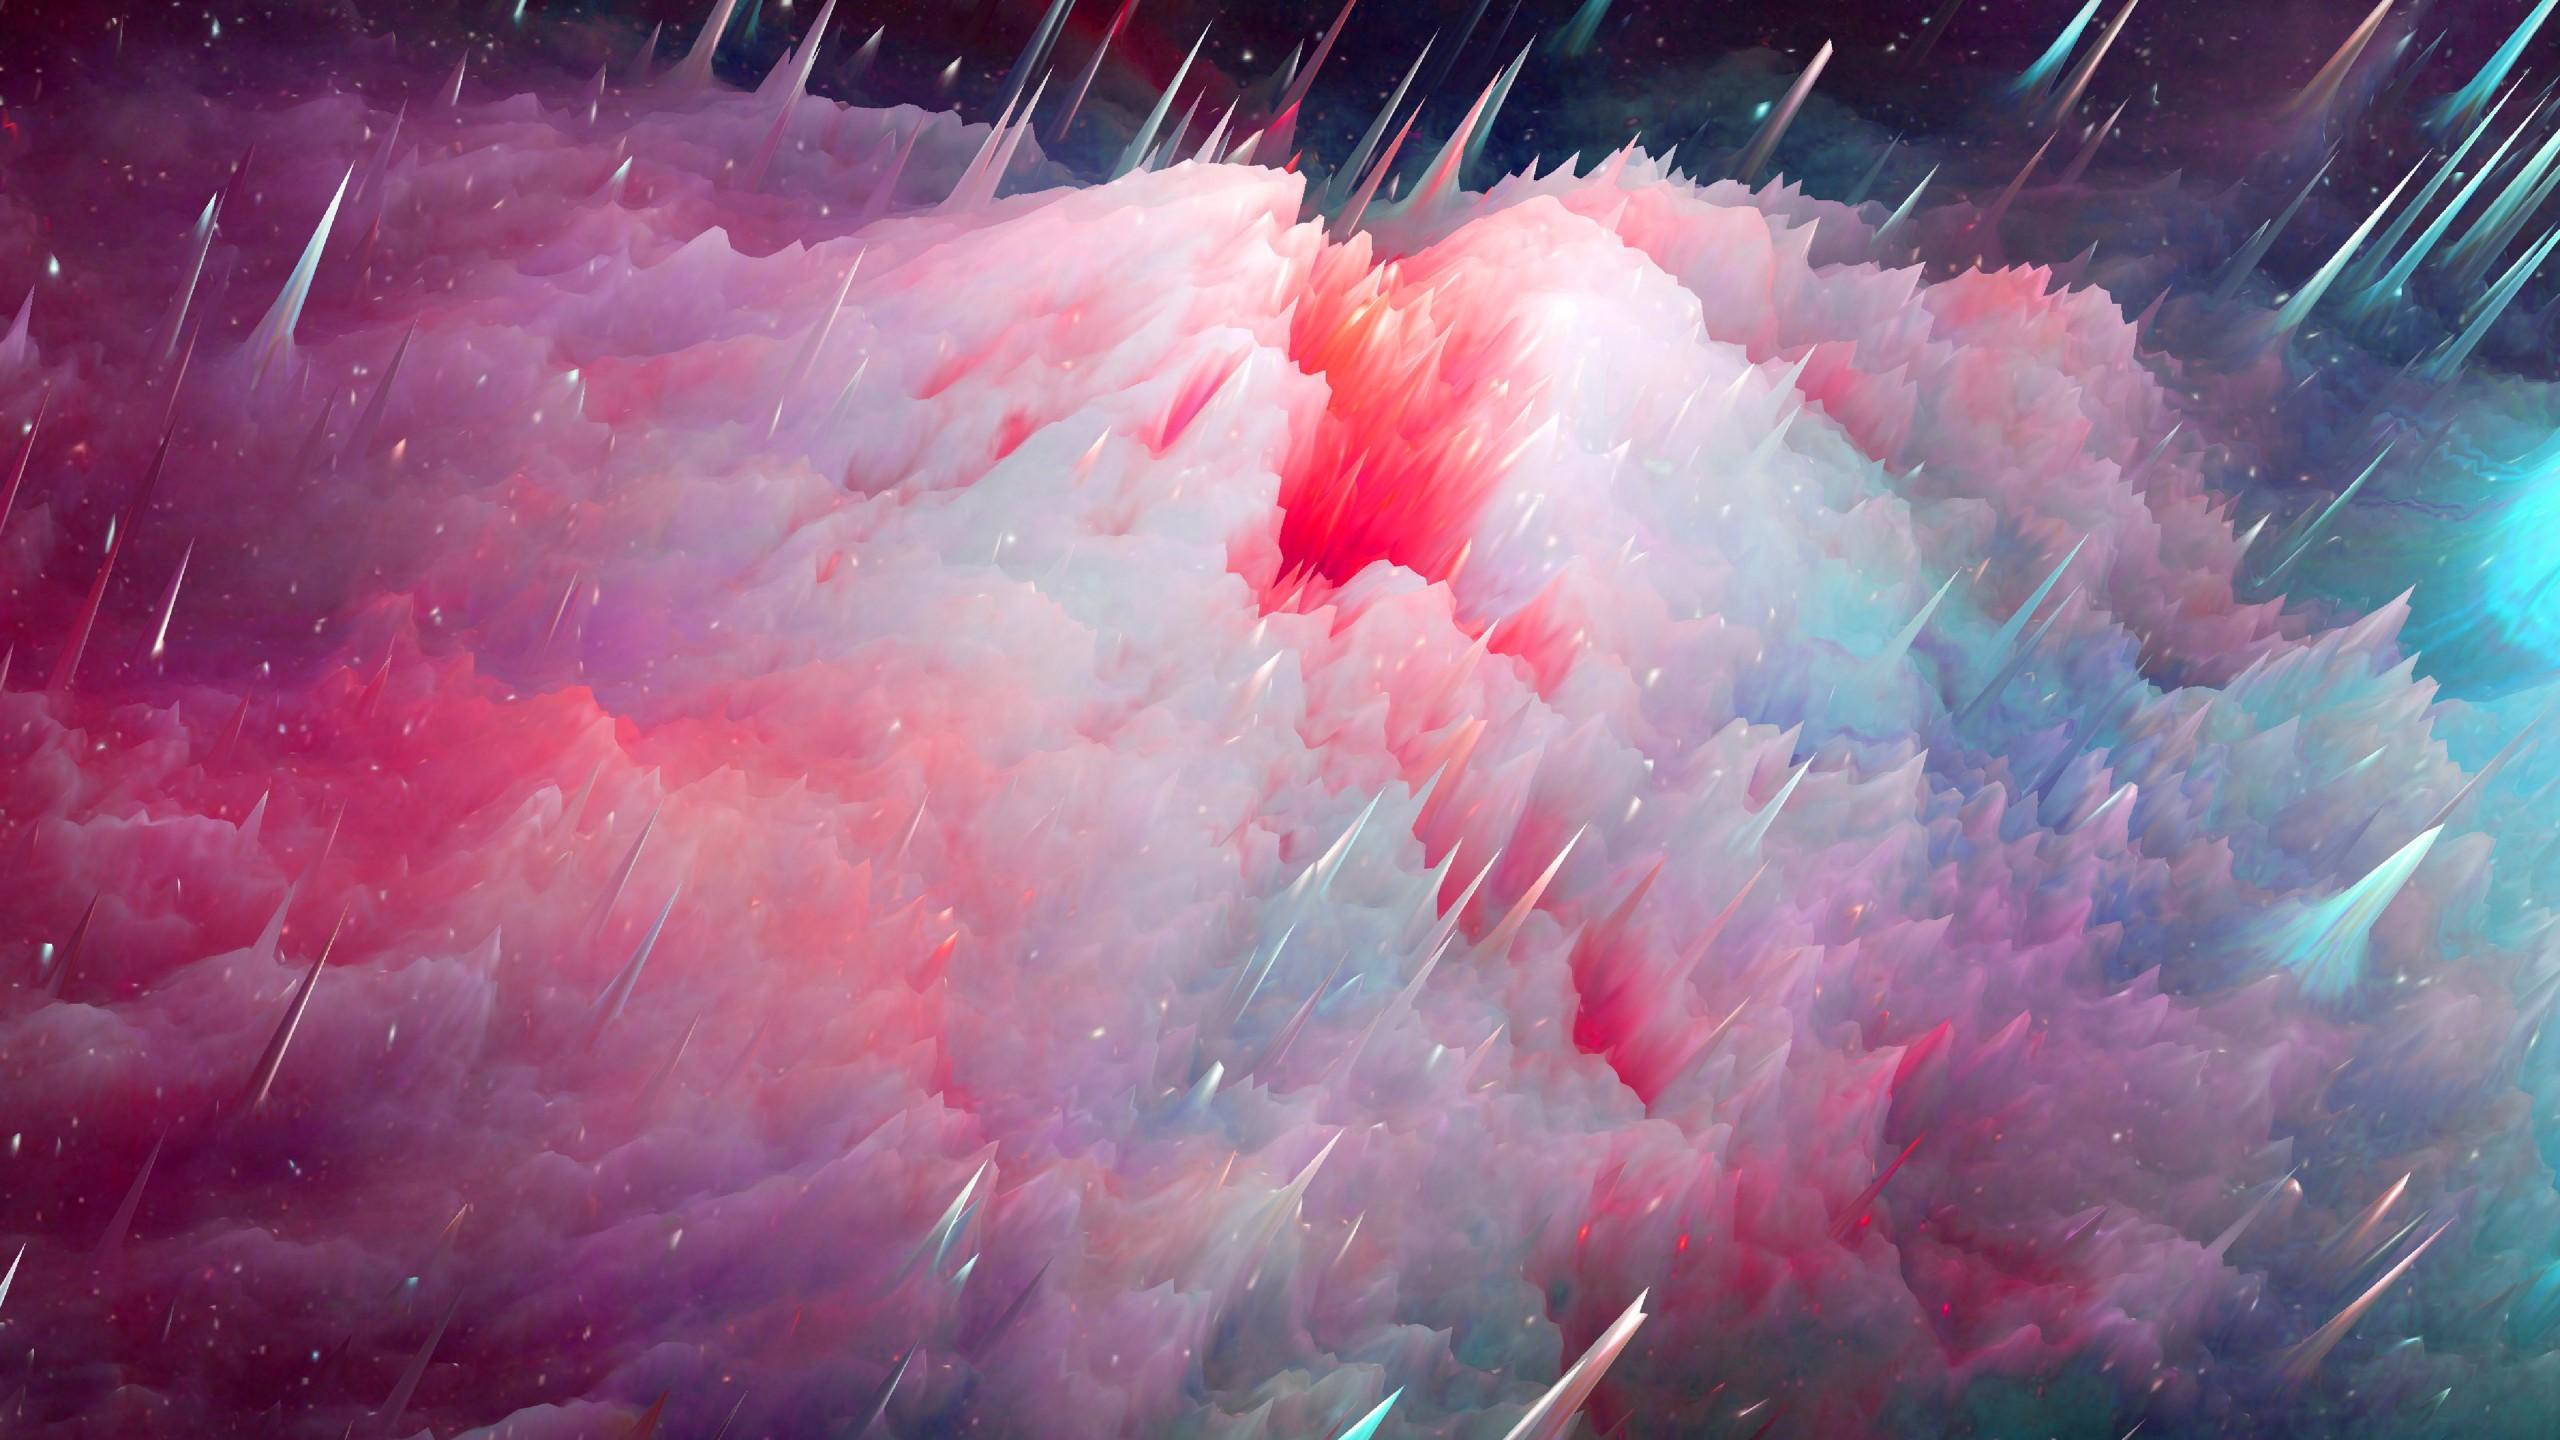 Pc Wallpaper Full Hd 3d Nebula 4k Wallpapers Hd Wallpapers Id 25767